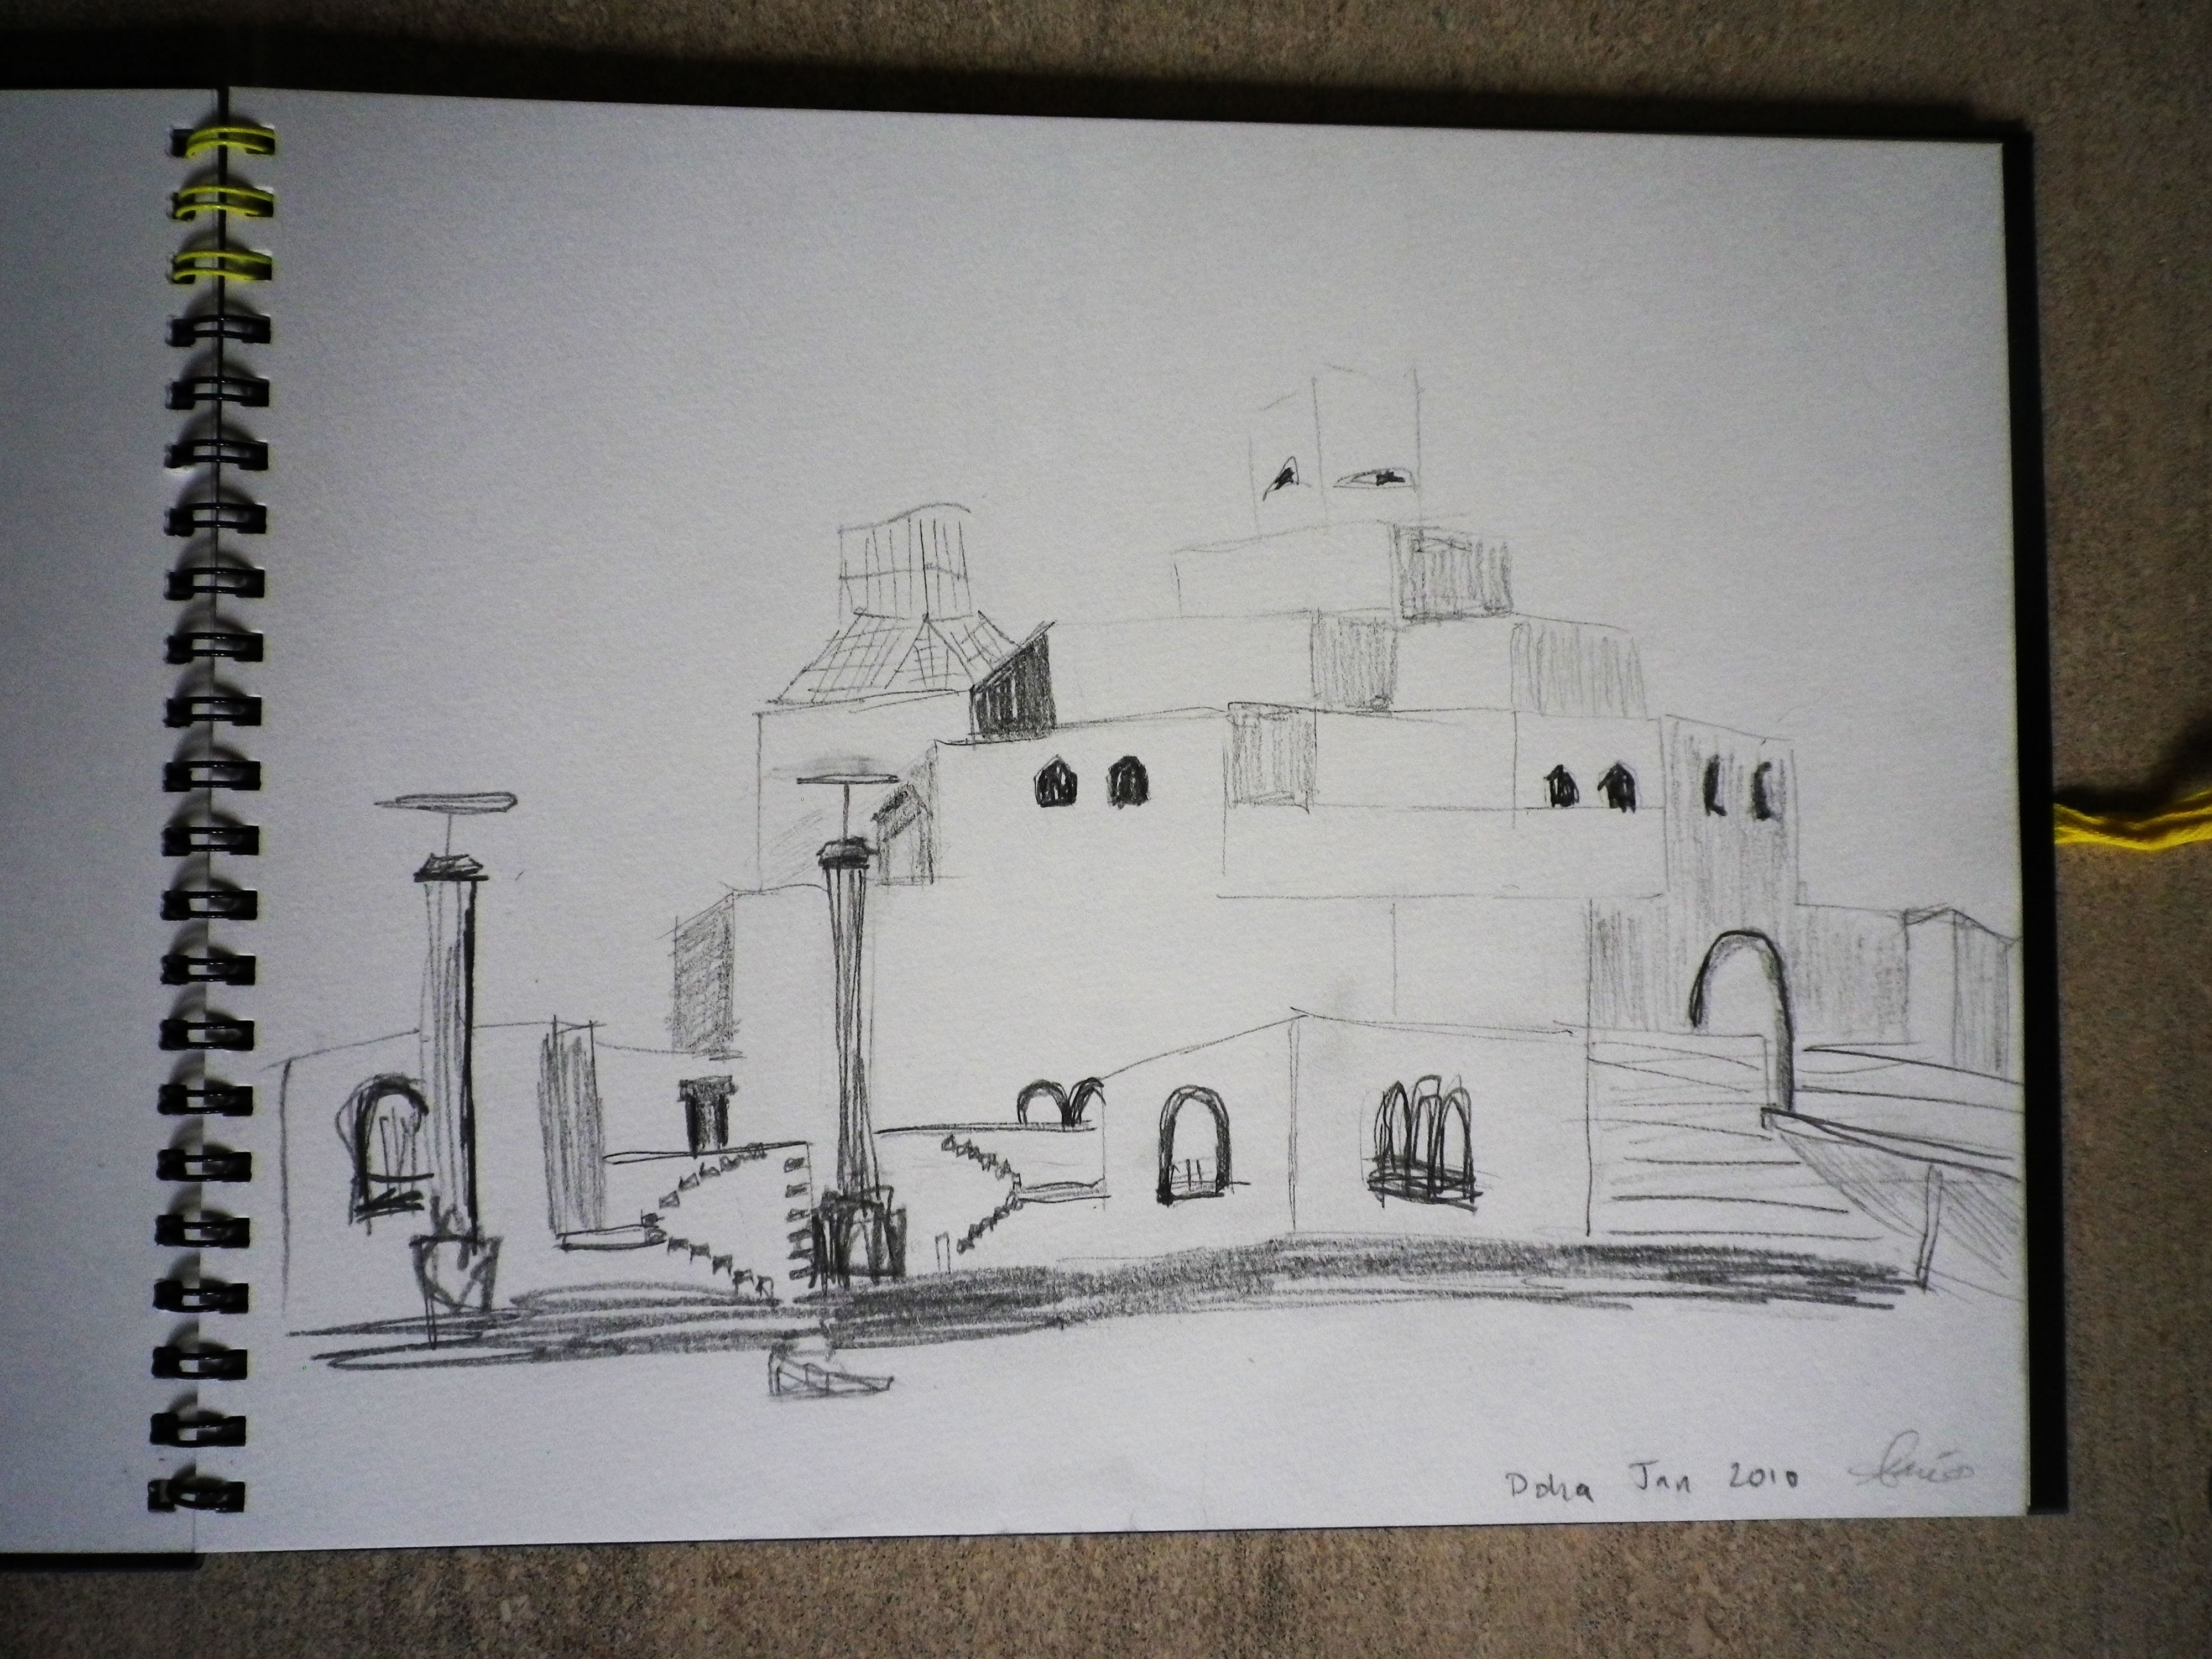 Pencil sketch: Museum of Islamic Arts, Doha 2010